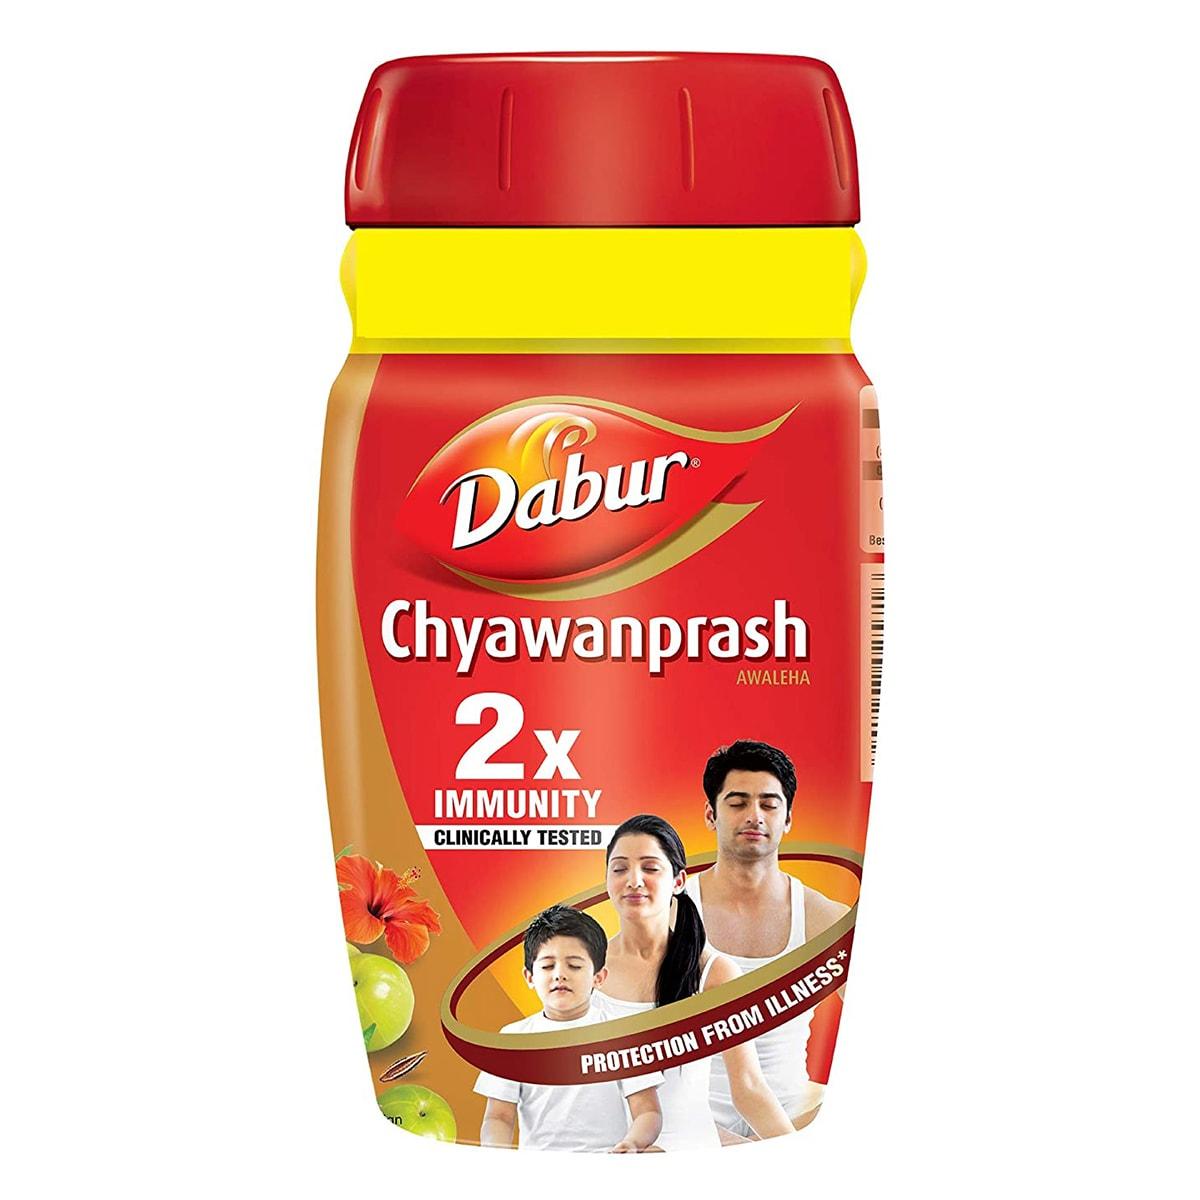 Buy Dabur Chyawanprash - 500 gm